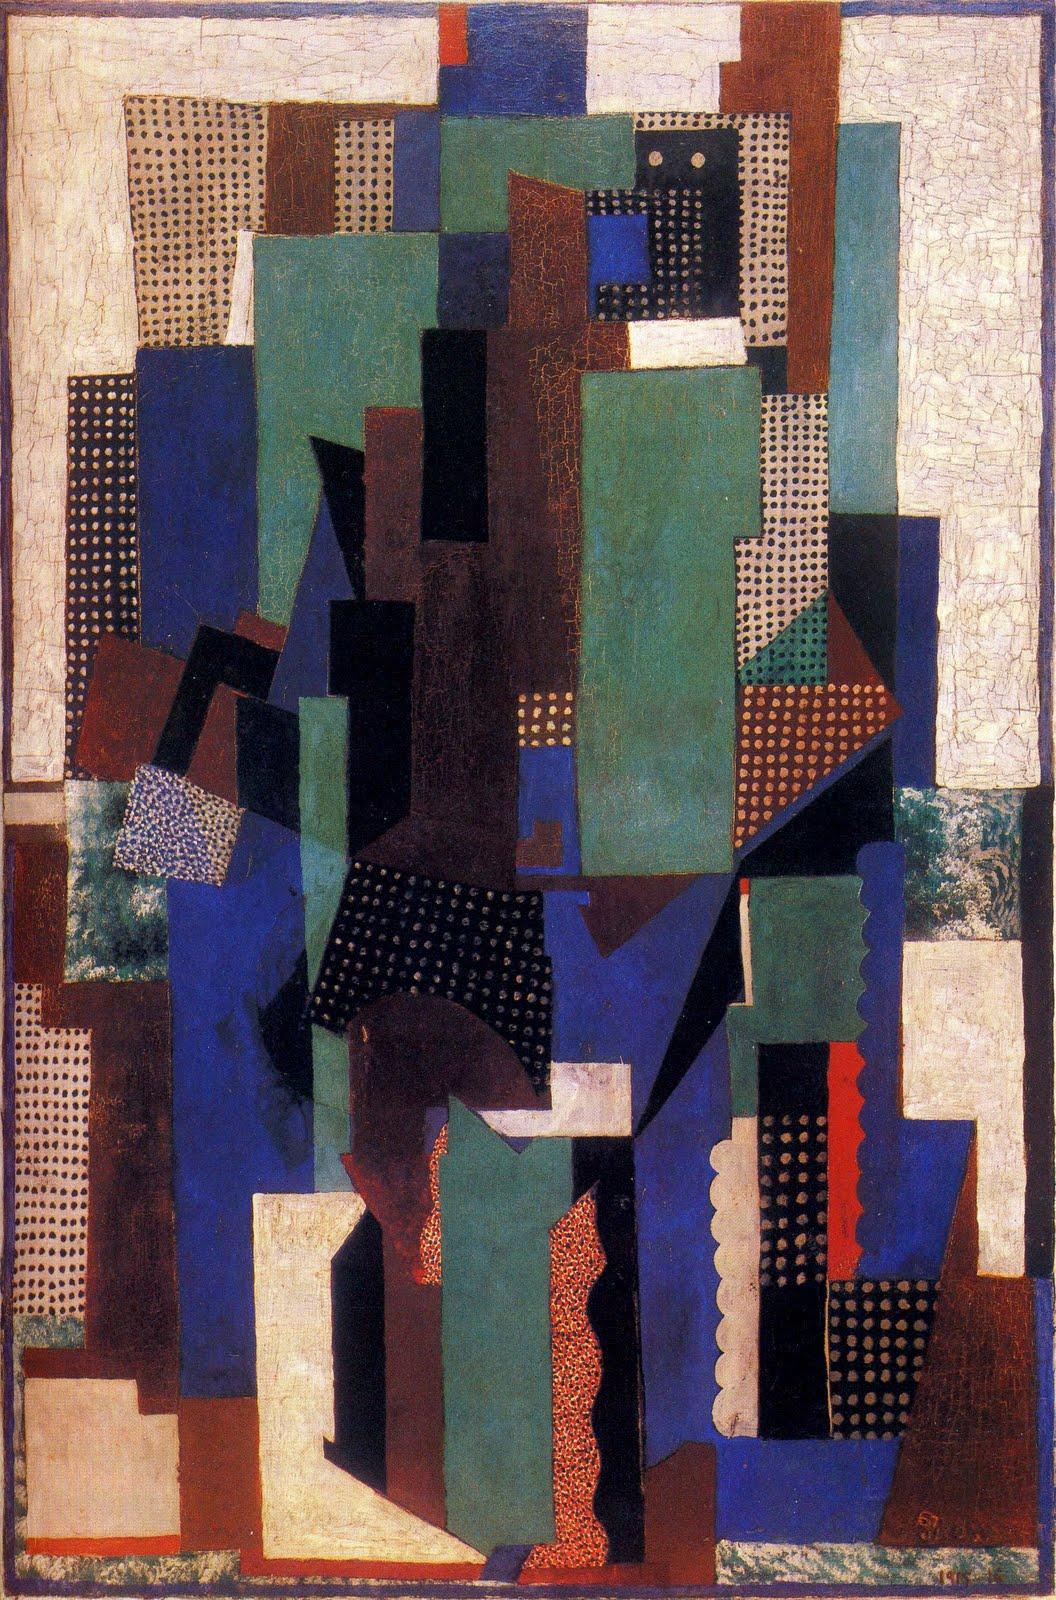 Modern Art with Professor Blanchard: Cubism and Futurism